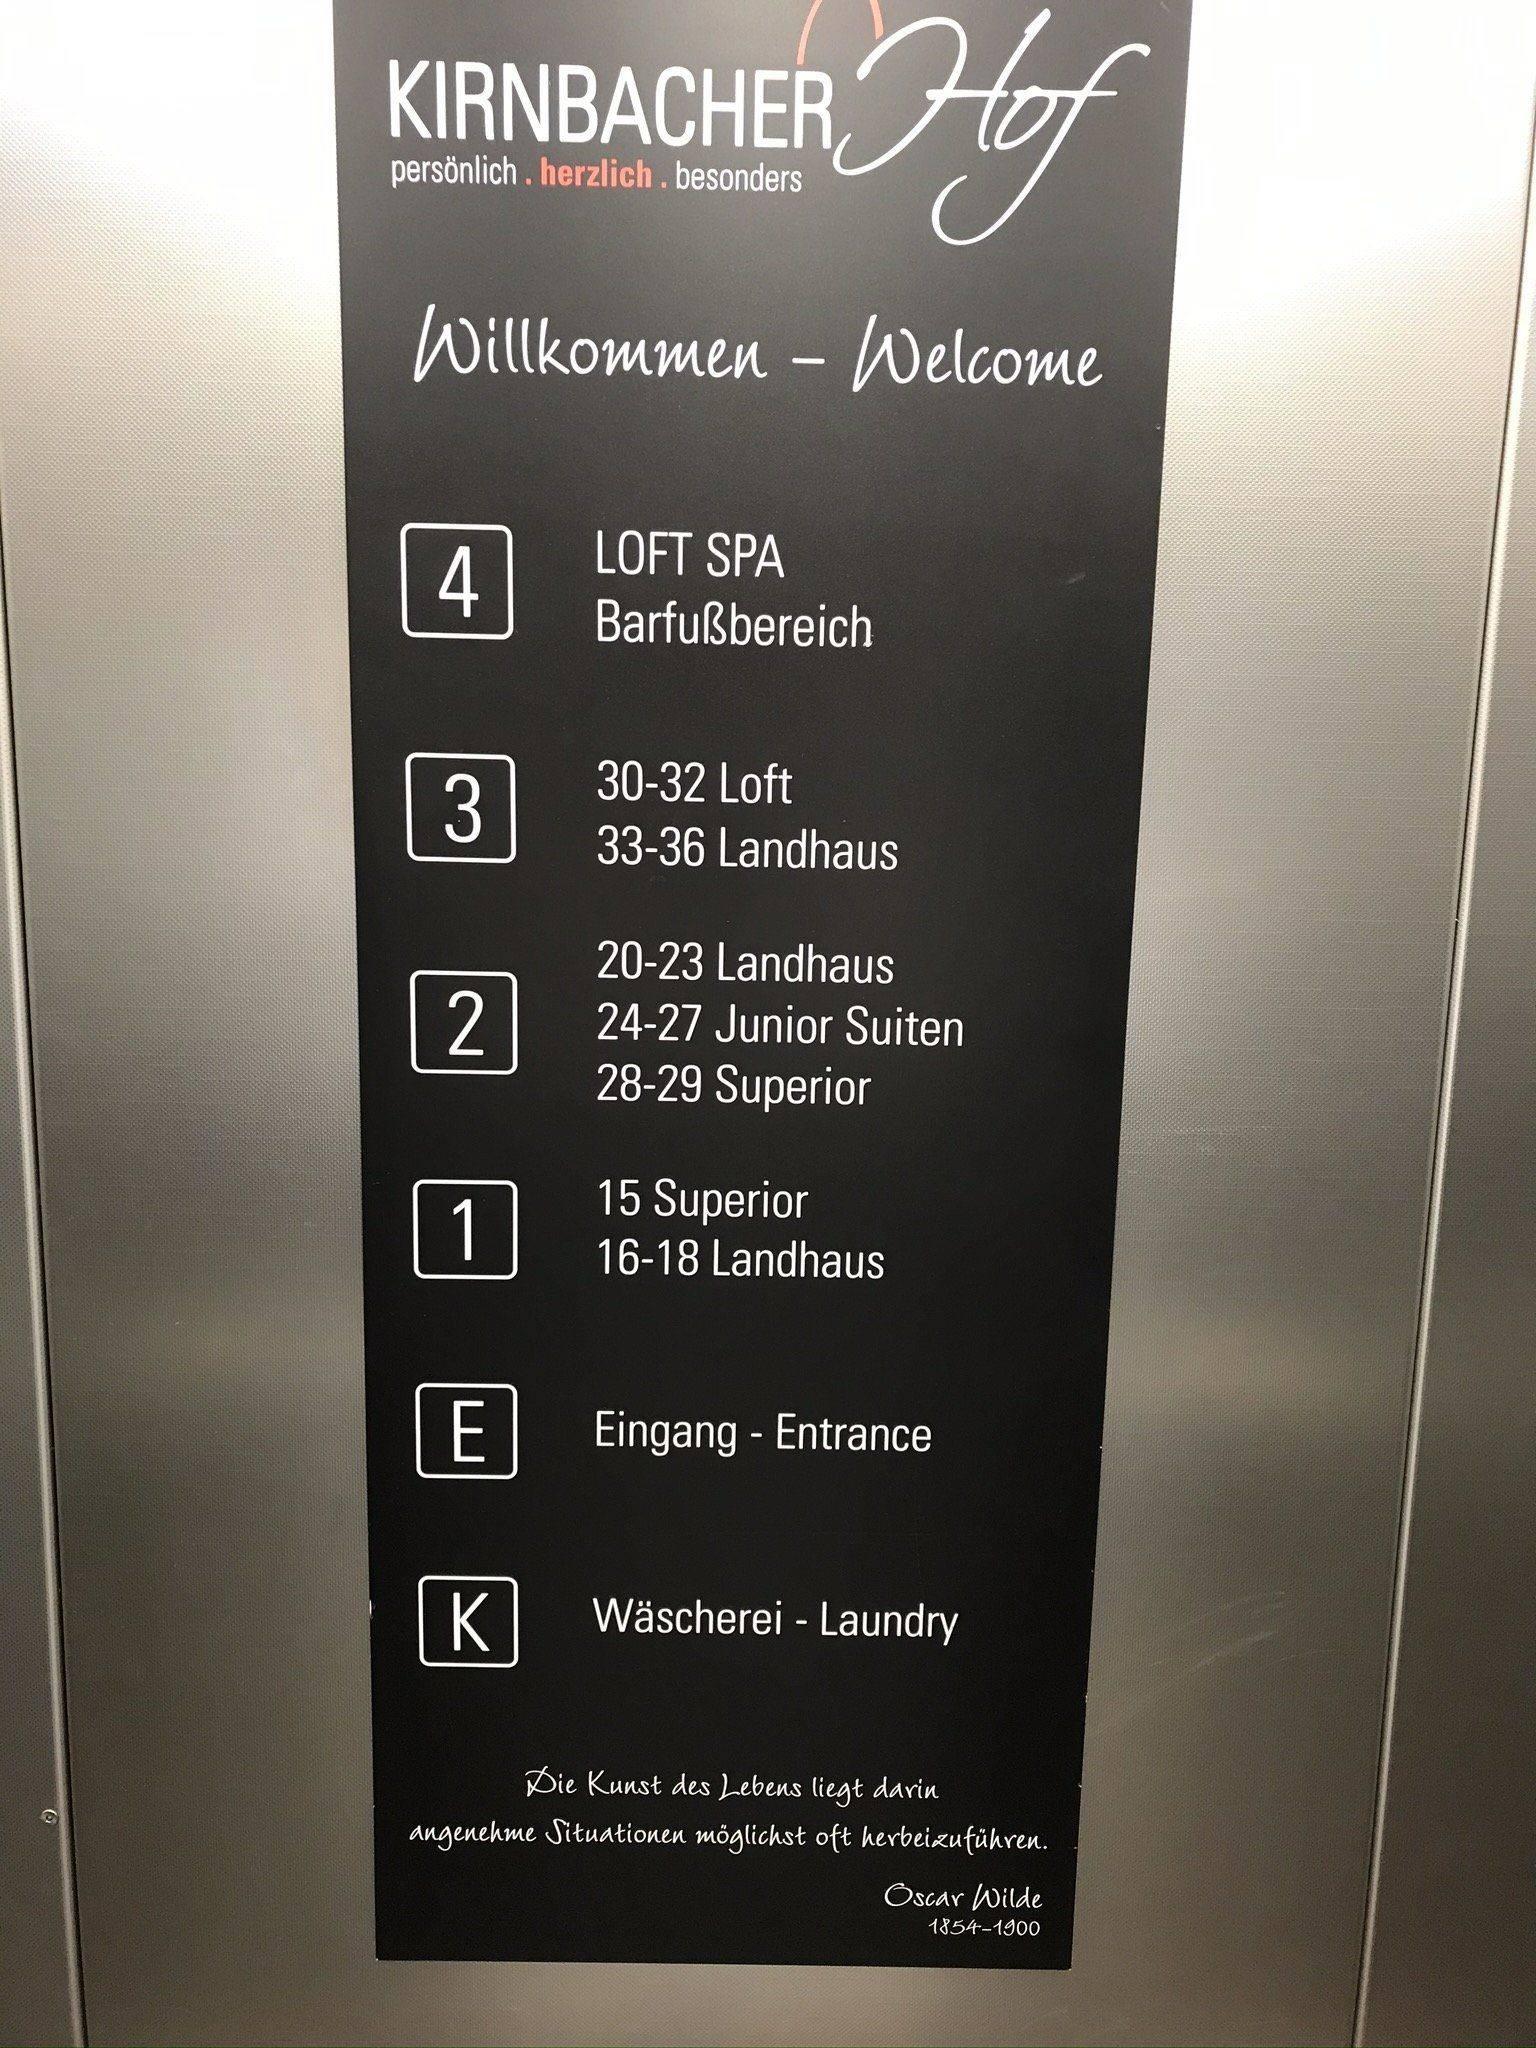 Kirnbacher Hof Etagen Übersicht